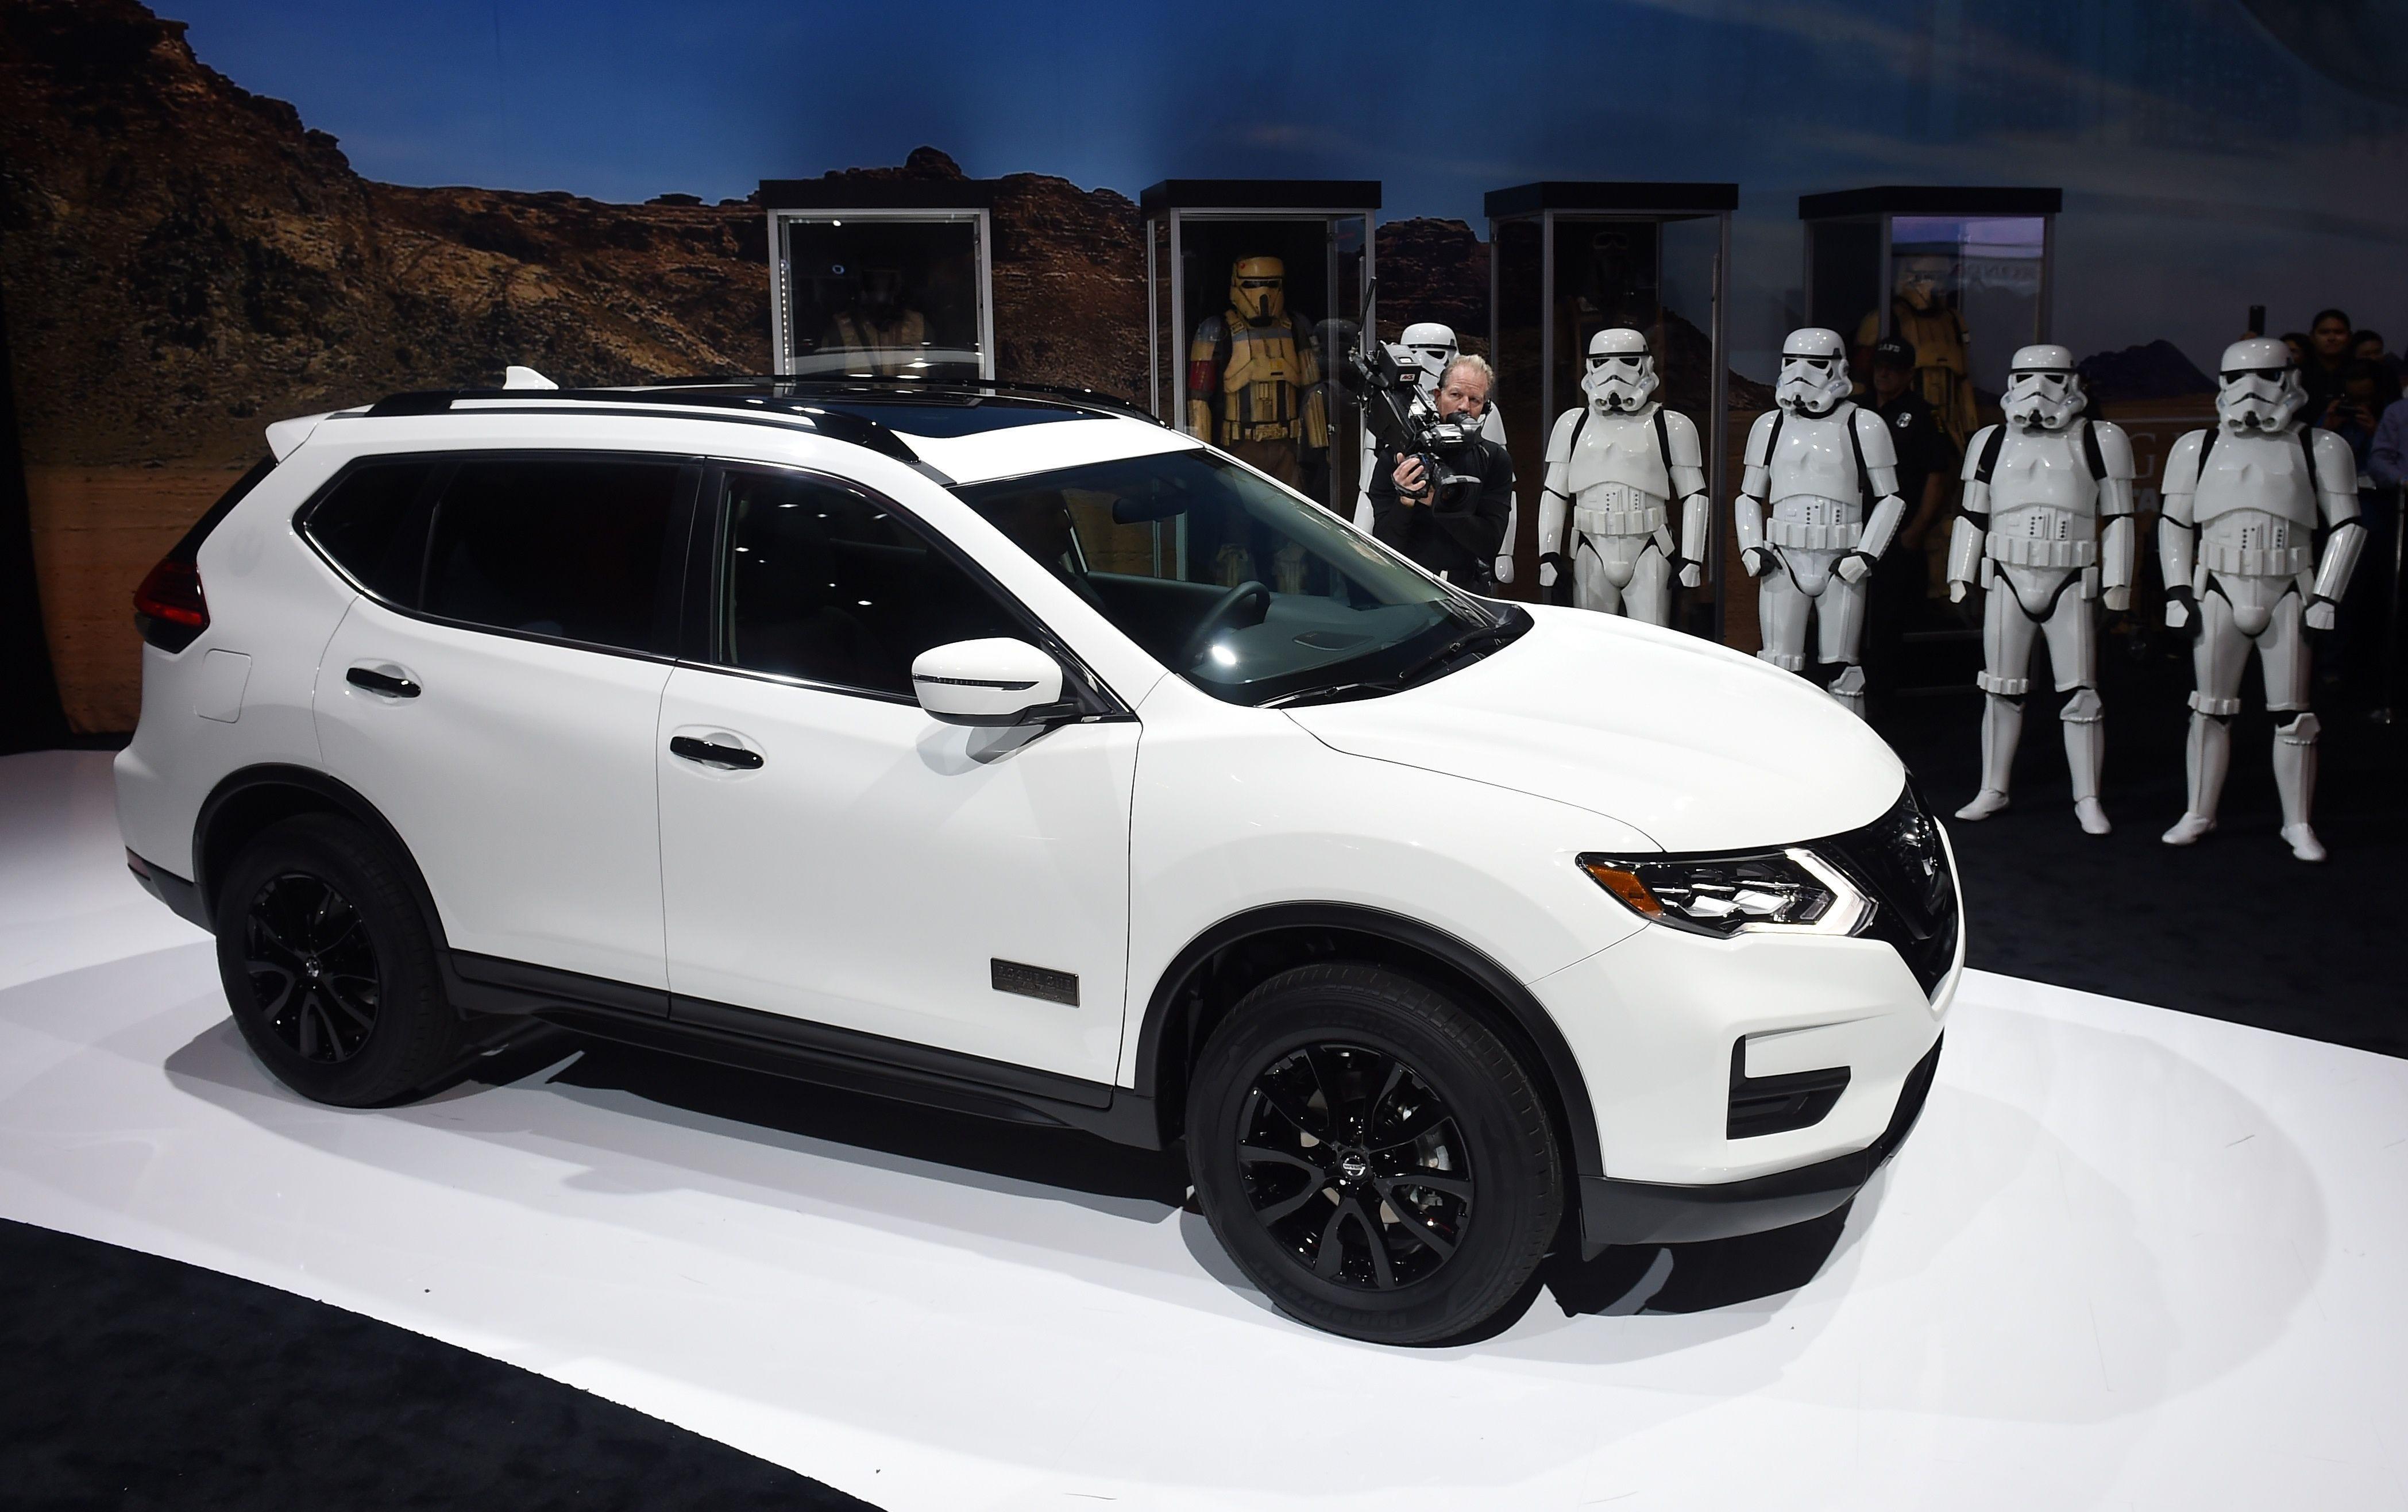 Toyota, Nissan take sales hit despite crossover boom